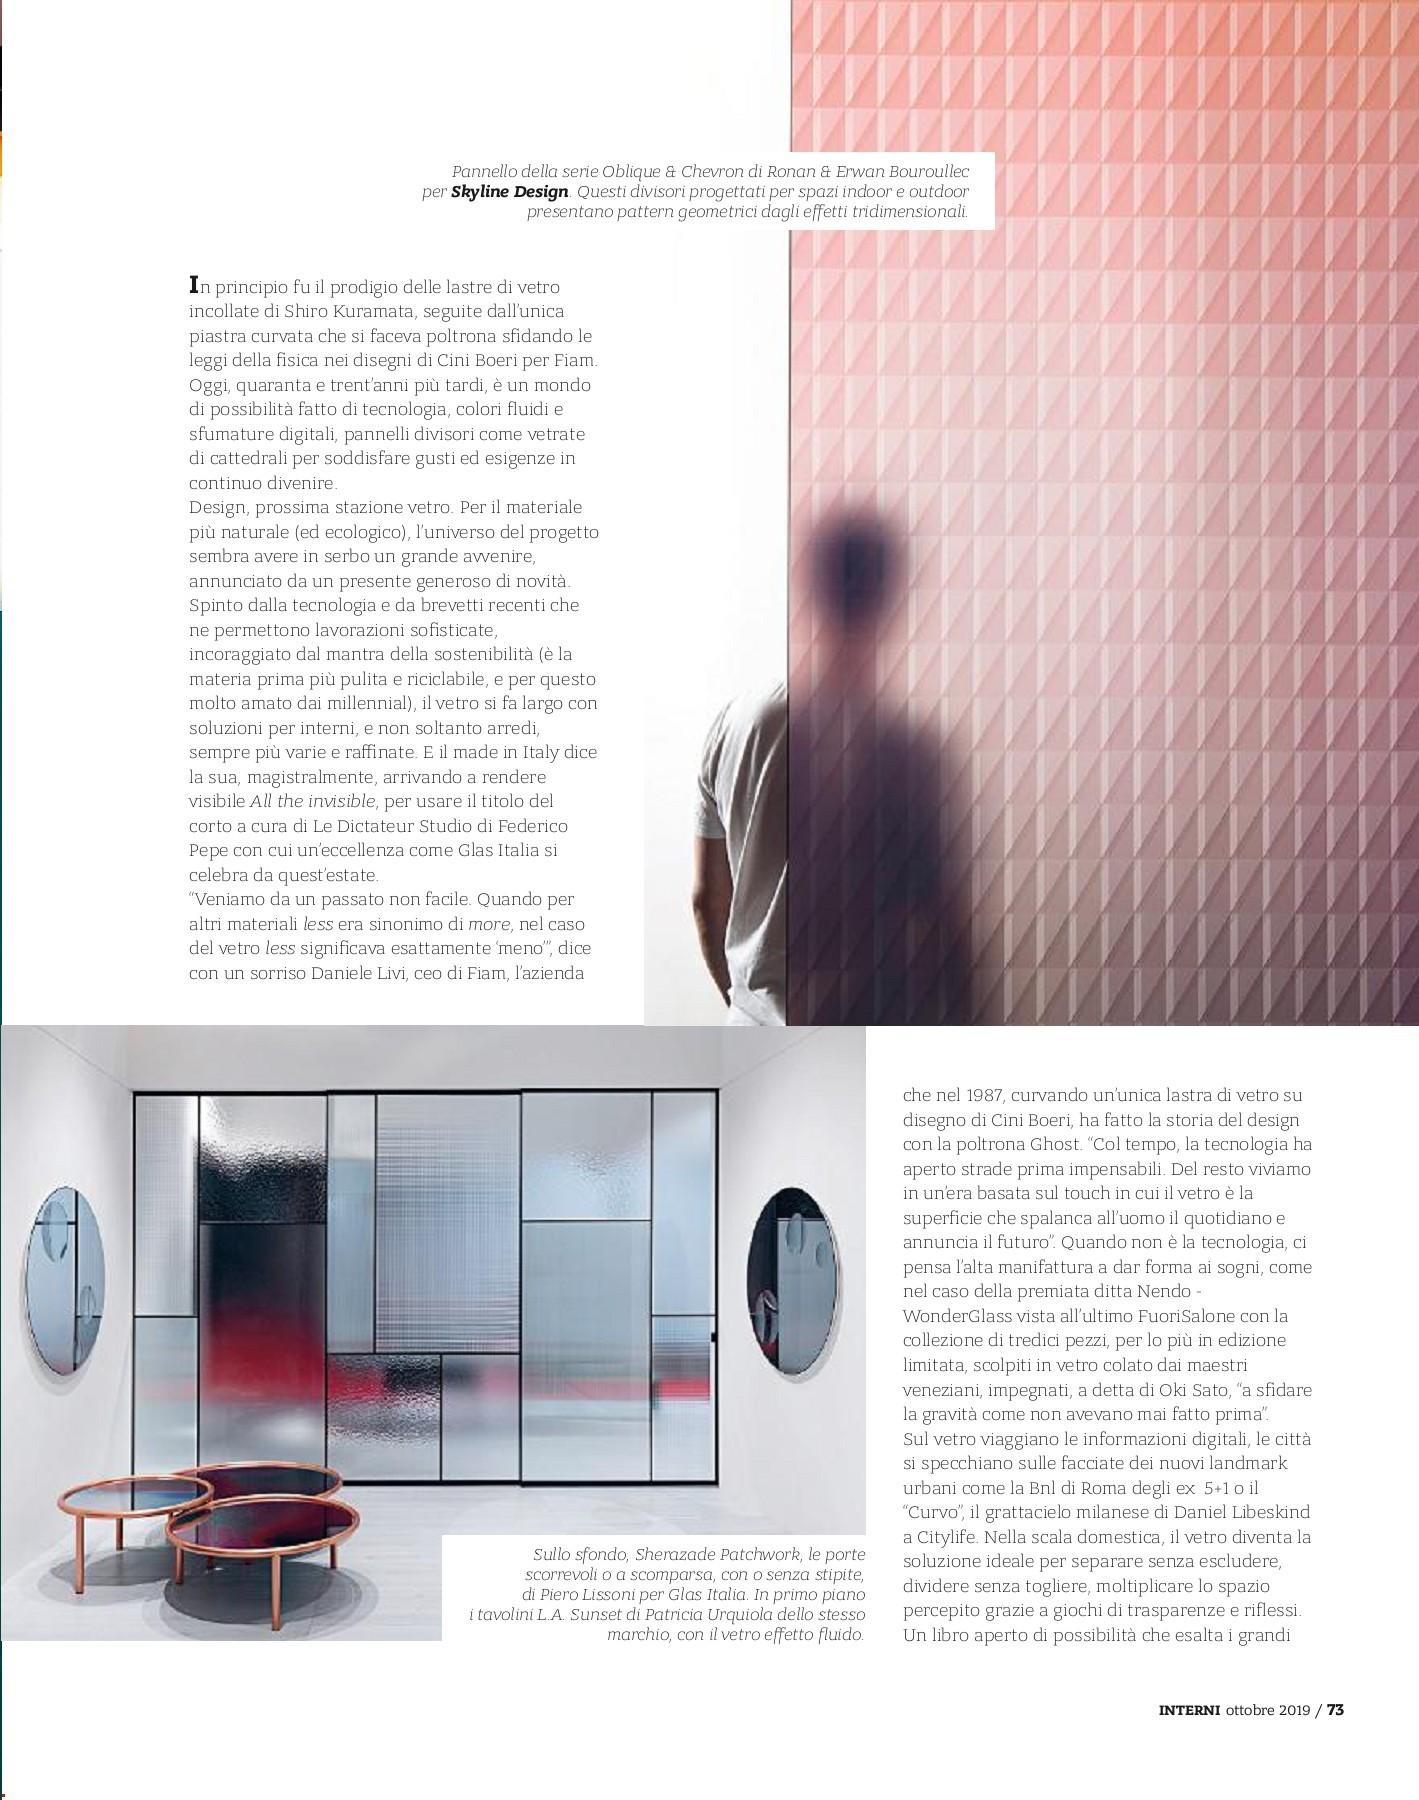 Porte Interne Usate Bianche interni italia_oct 2019-flip book pages 201-250 | pubhtml5